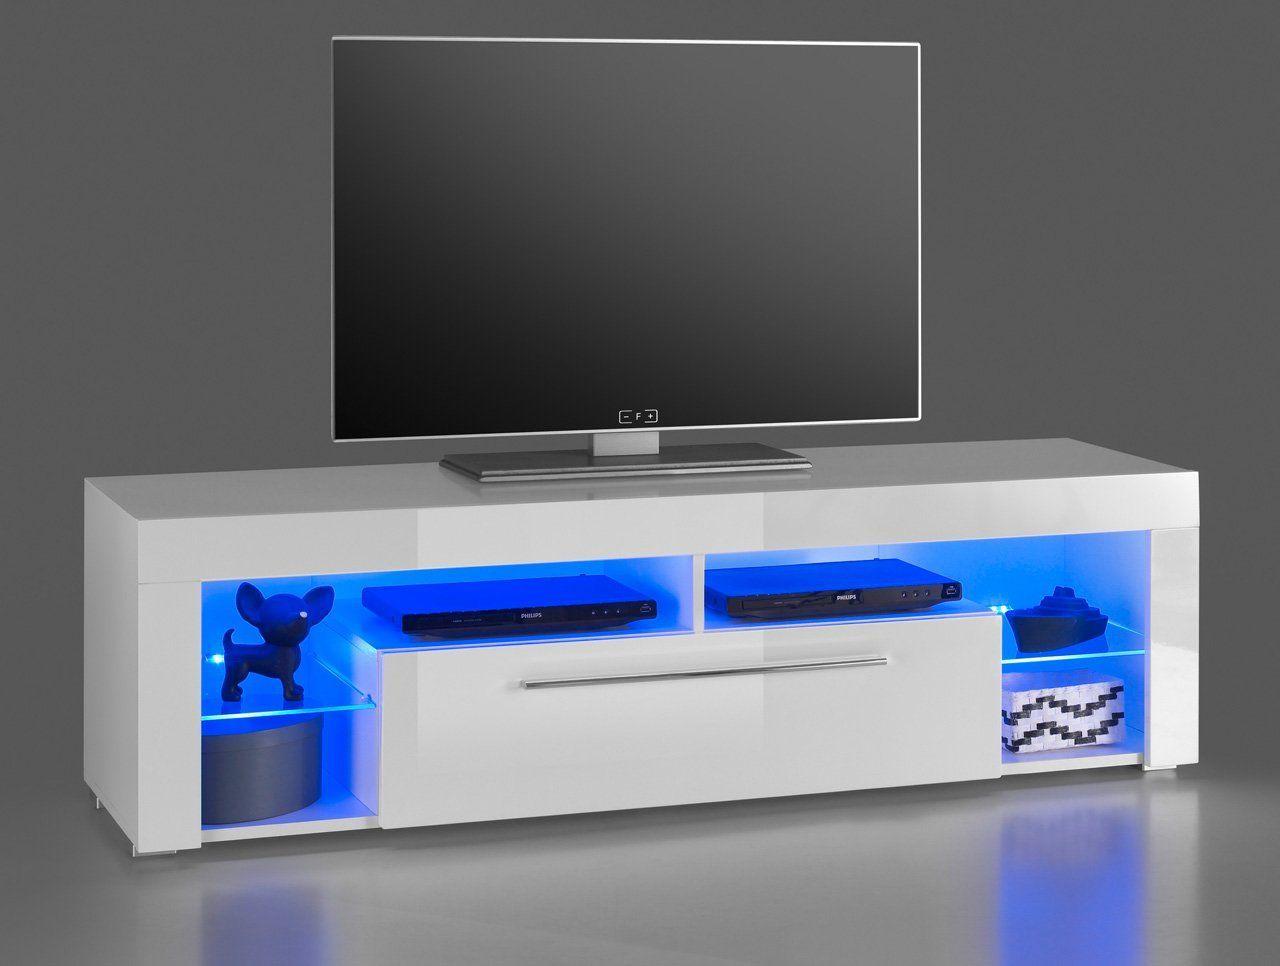 Lifestyle4living Lowboard Tv Schrank Tv Board Fernsehschrank Tv Sideboard Tv Unterschrank Tv Kommode Hochglanz Led Beleuc In 2020 Tv Stand Tv Lowboard Tv Shelf